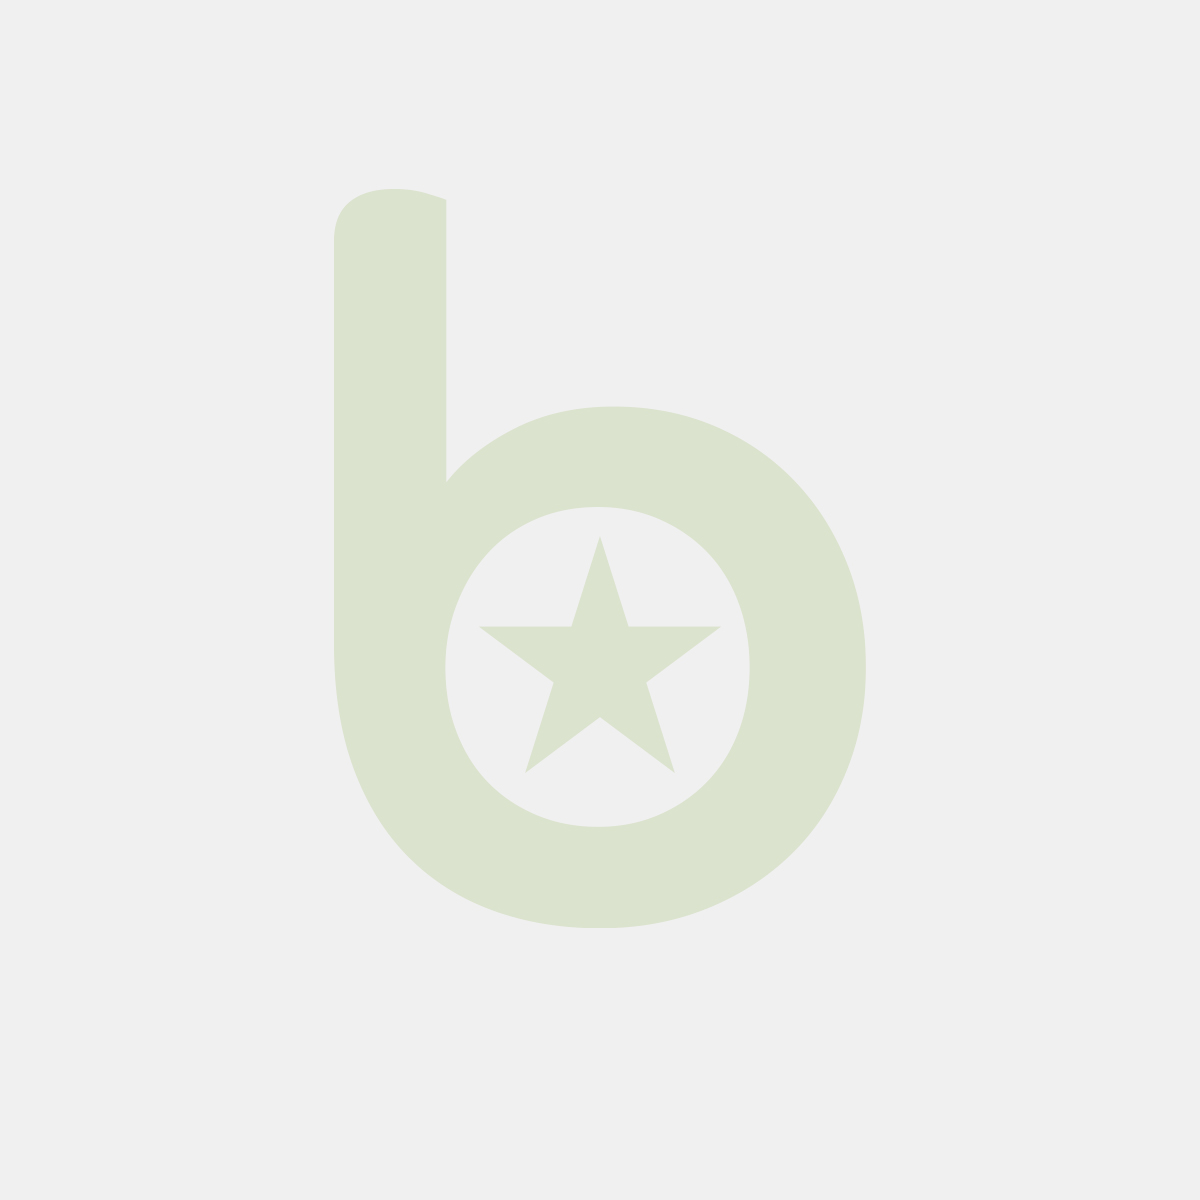 FINGERFOOD - kubek 90ml PS biała 6,2x6,2x5,5 op. 25 sztuk